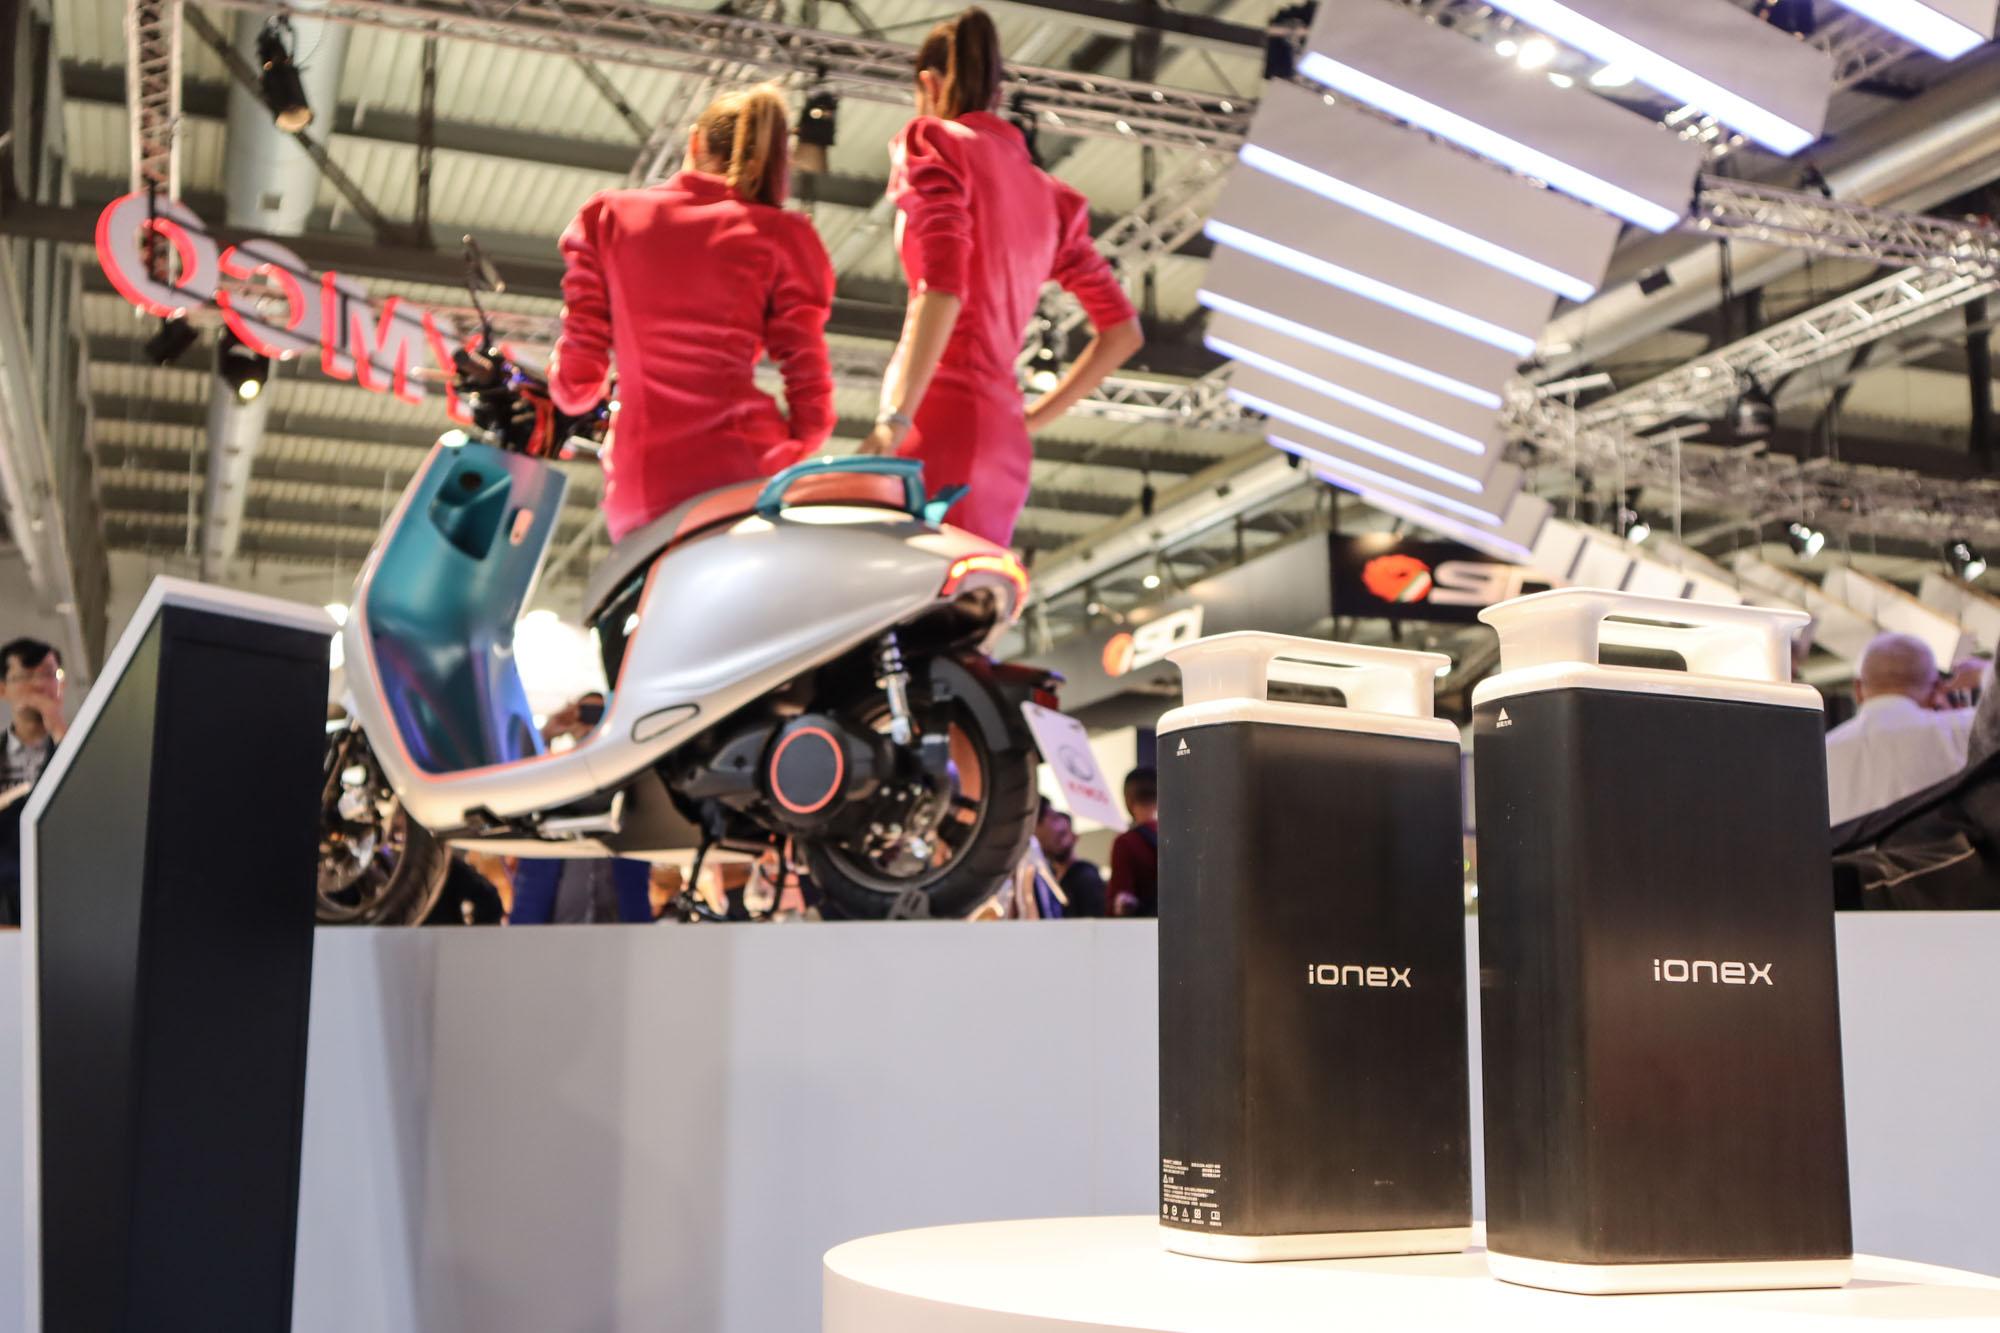 I-One DX 預計會於 2020 年在台上市,敬請期待。